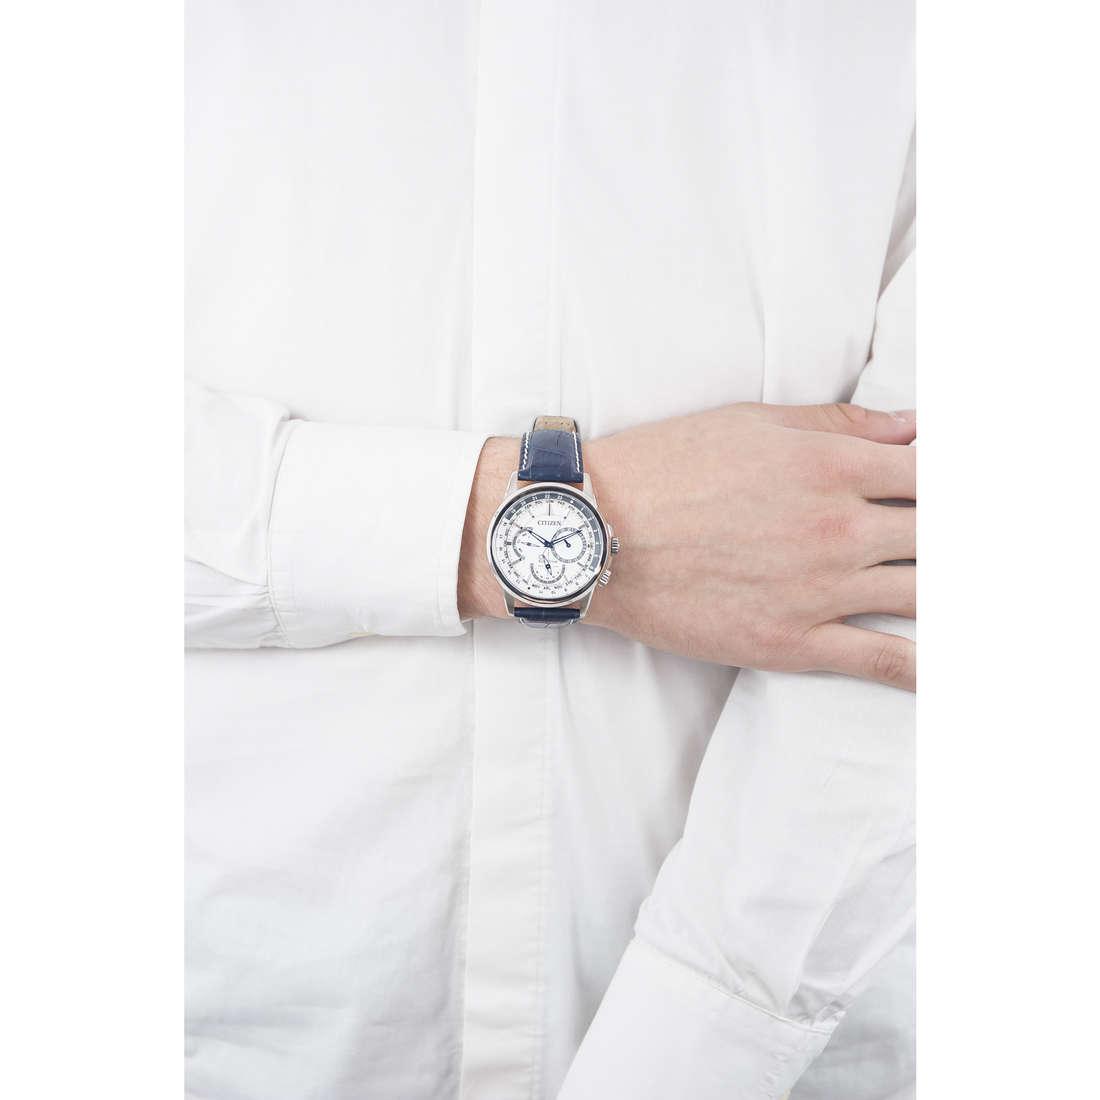 Citizen chronographes Calendrier homme BU2020-11A indosso